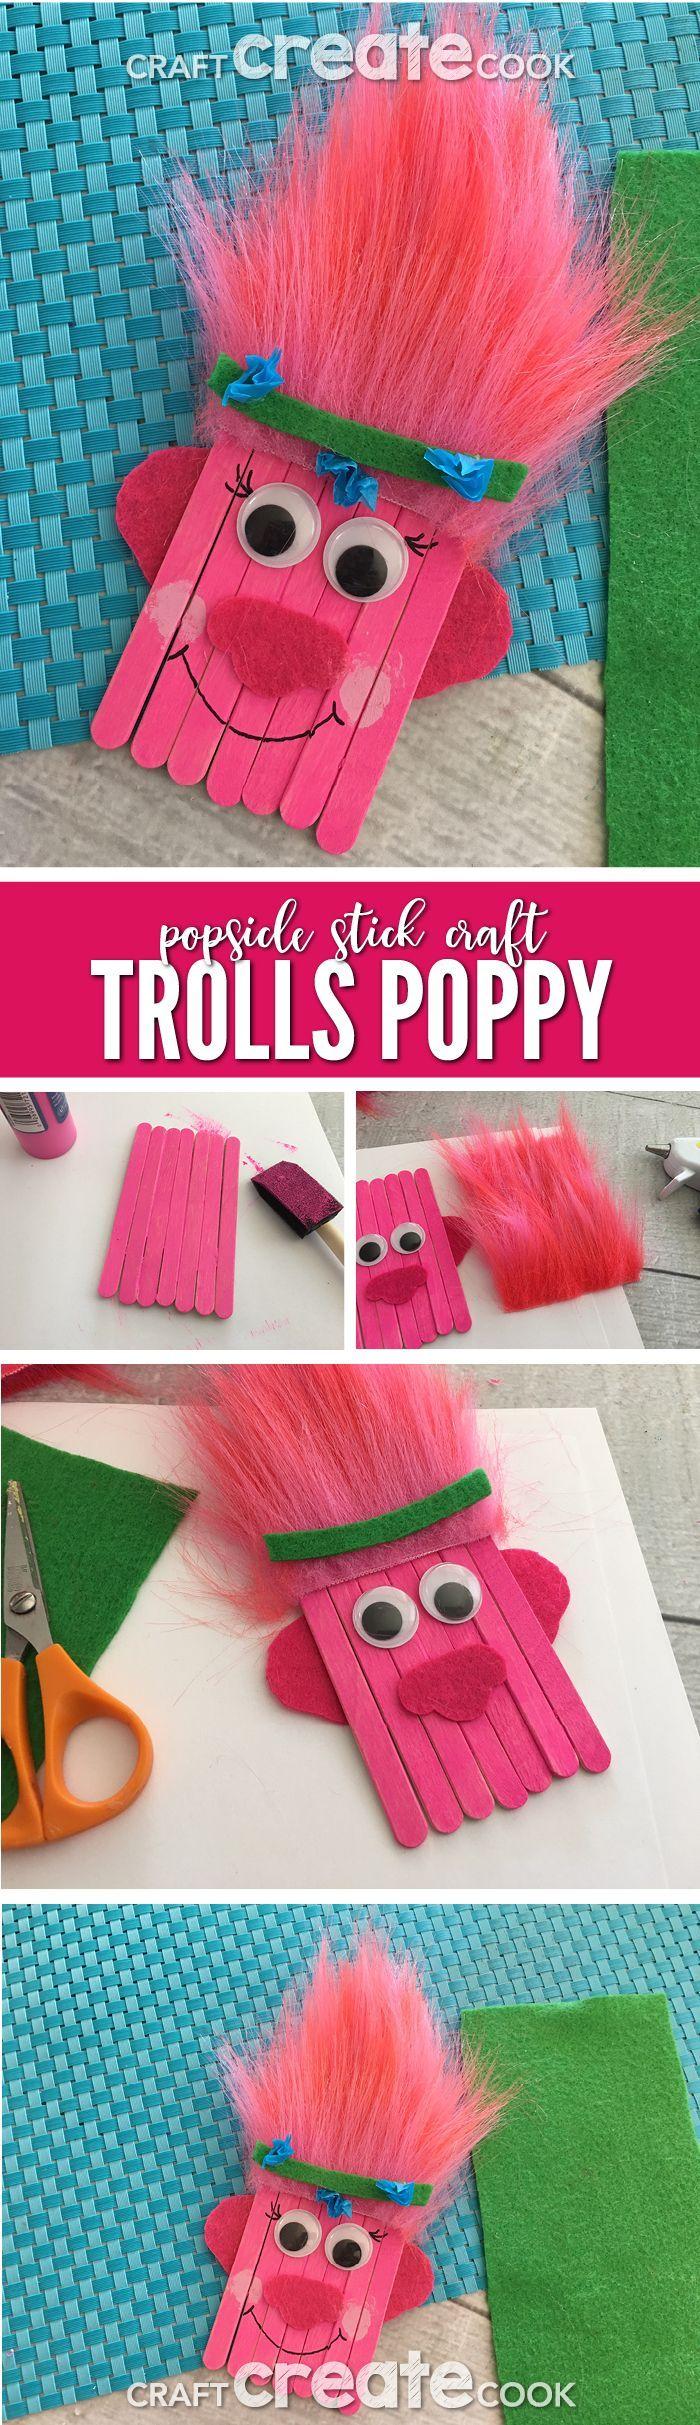 Photo of Trolls Poppy Popsicle Stick Craft for Kids